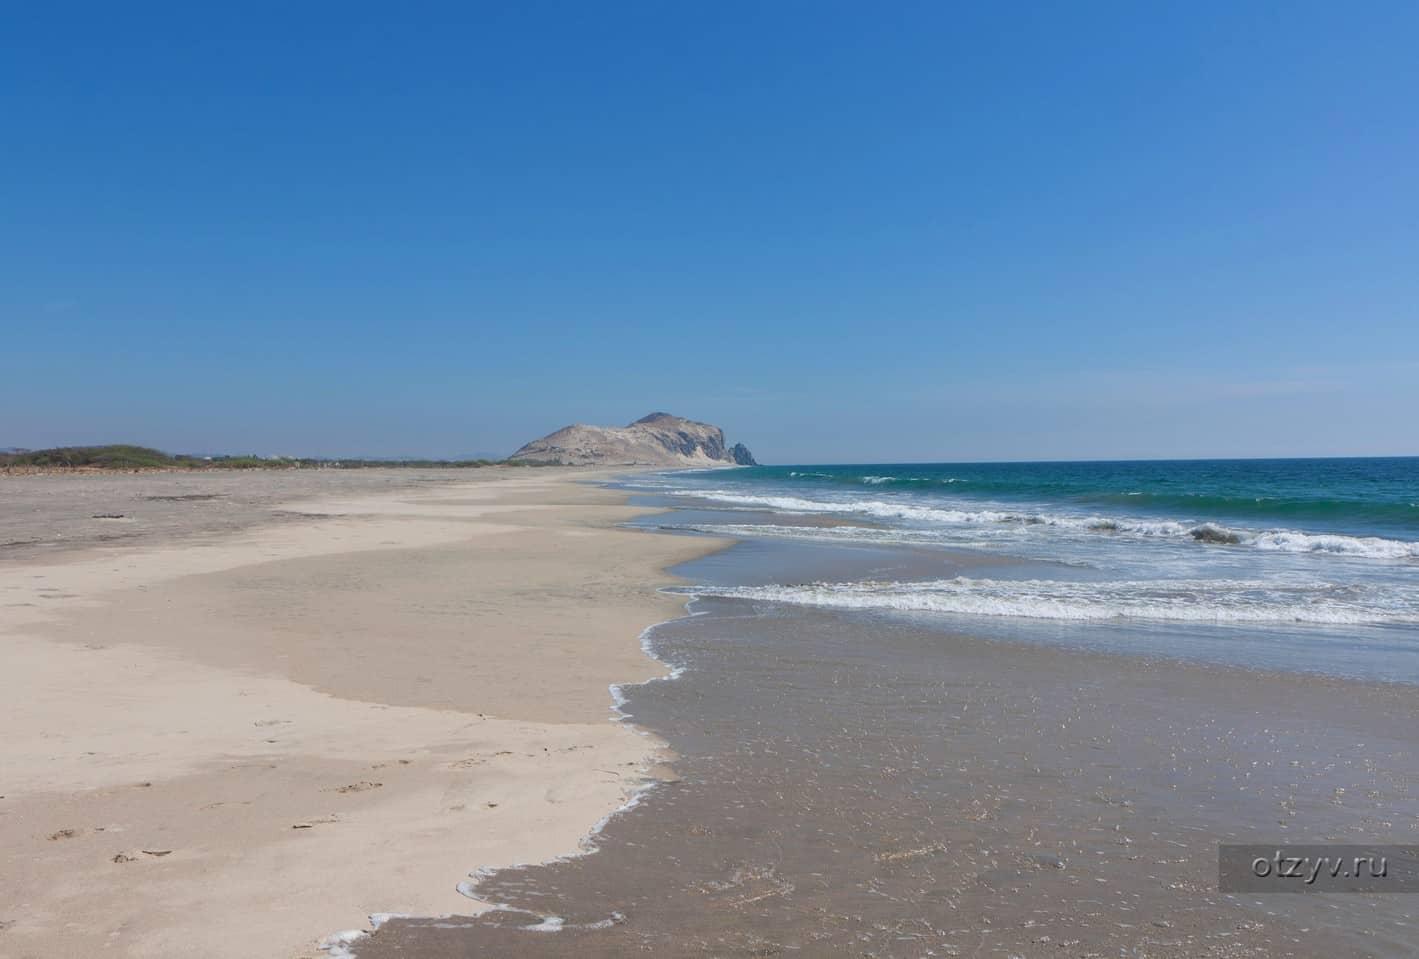 Bidderosa Beach/Oasis, Sardinia